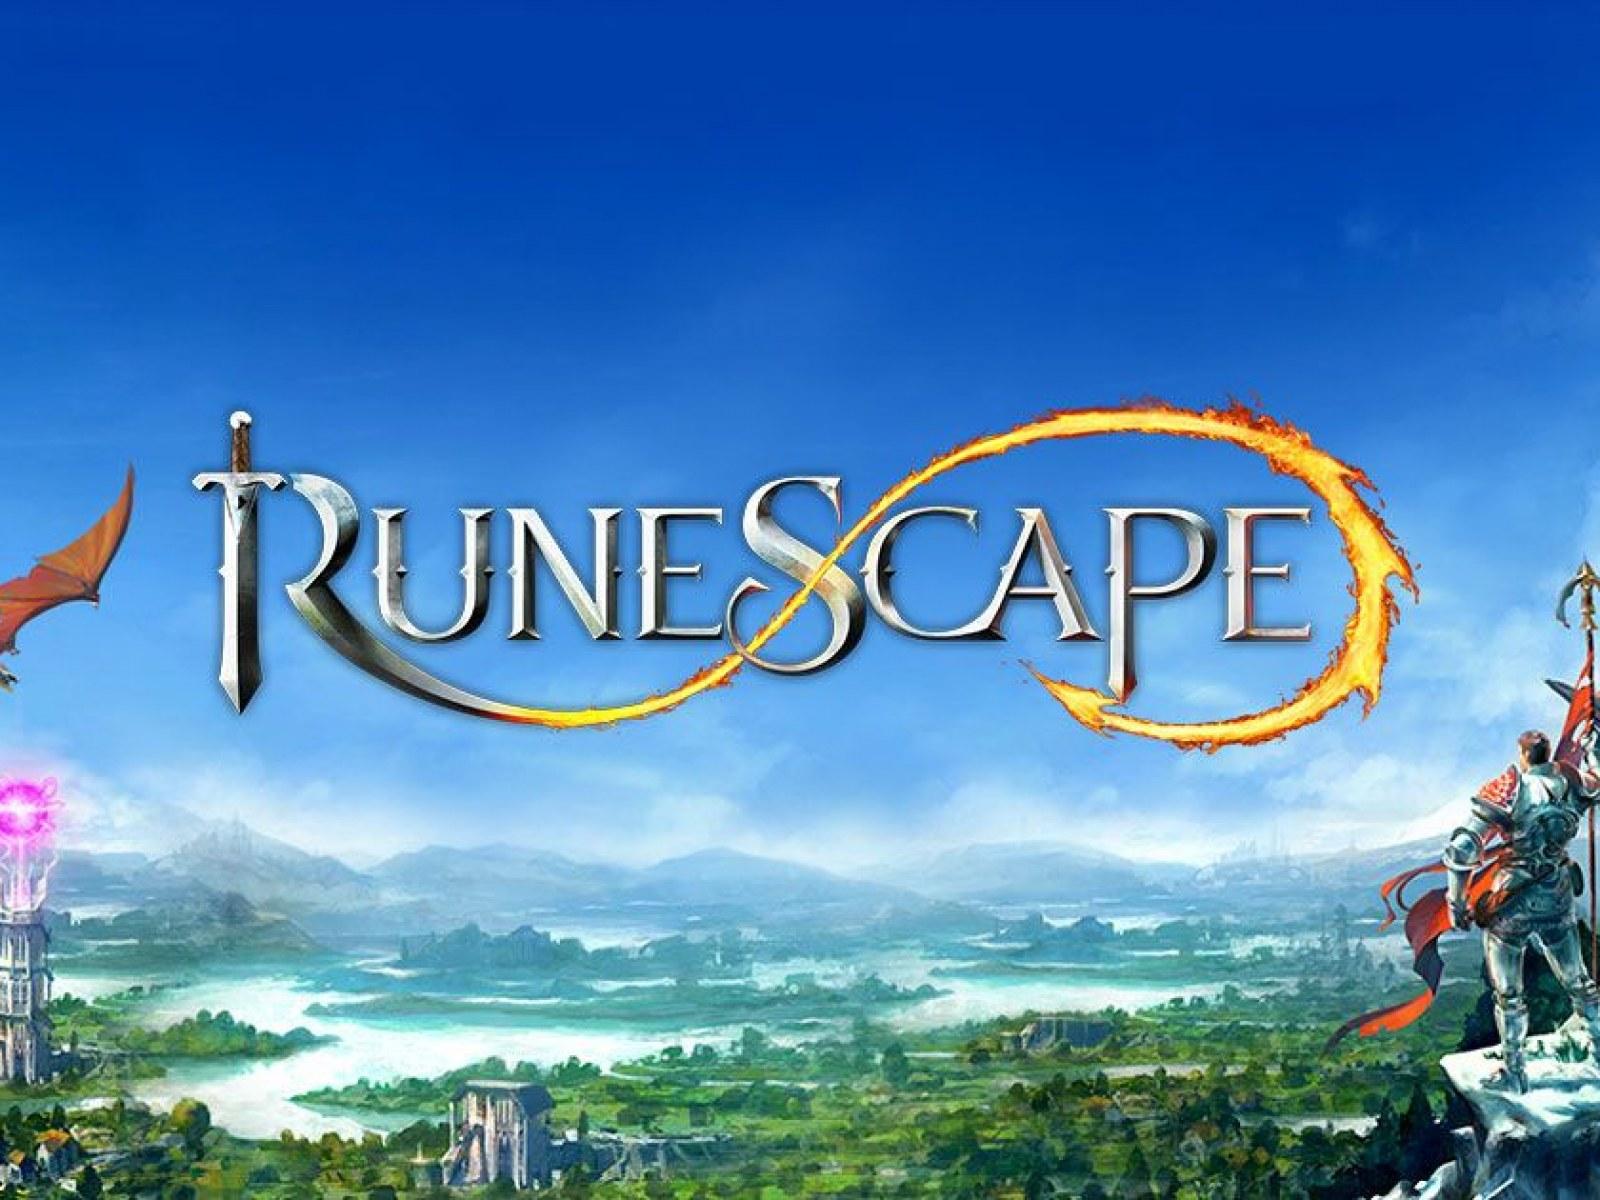 Runescape' Mining and Smithing Rework Update: Get Your Elder